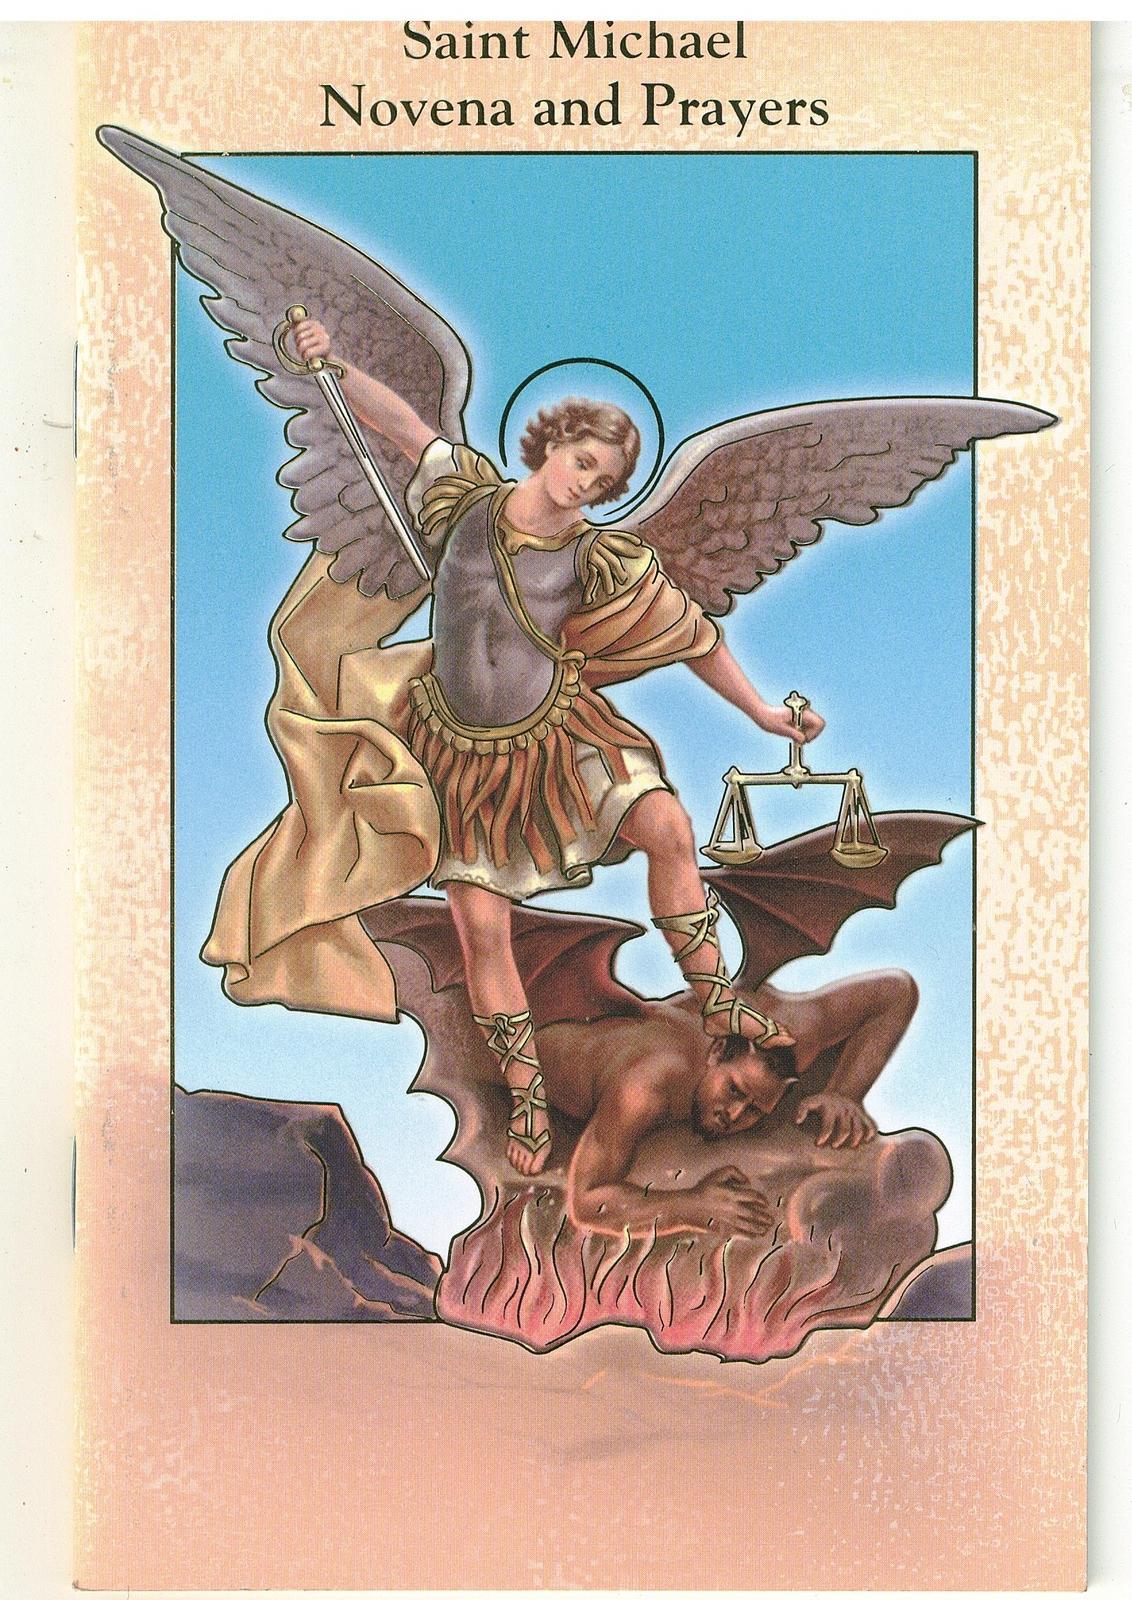 Saint michael novena and prayers 20440 001